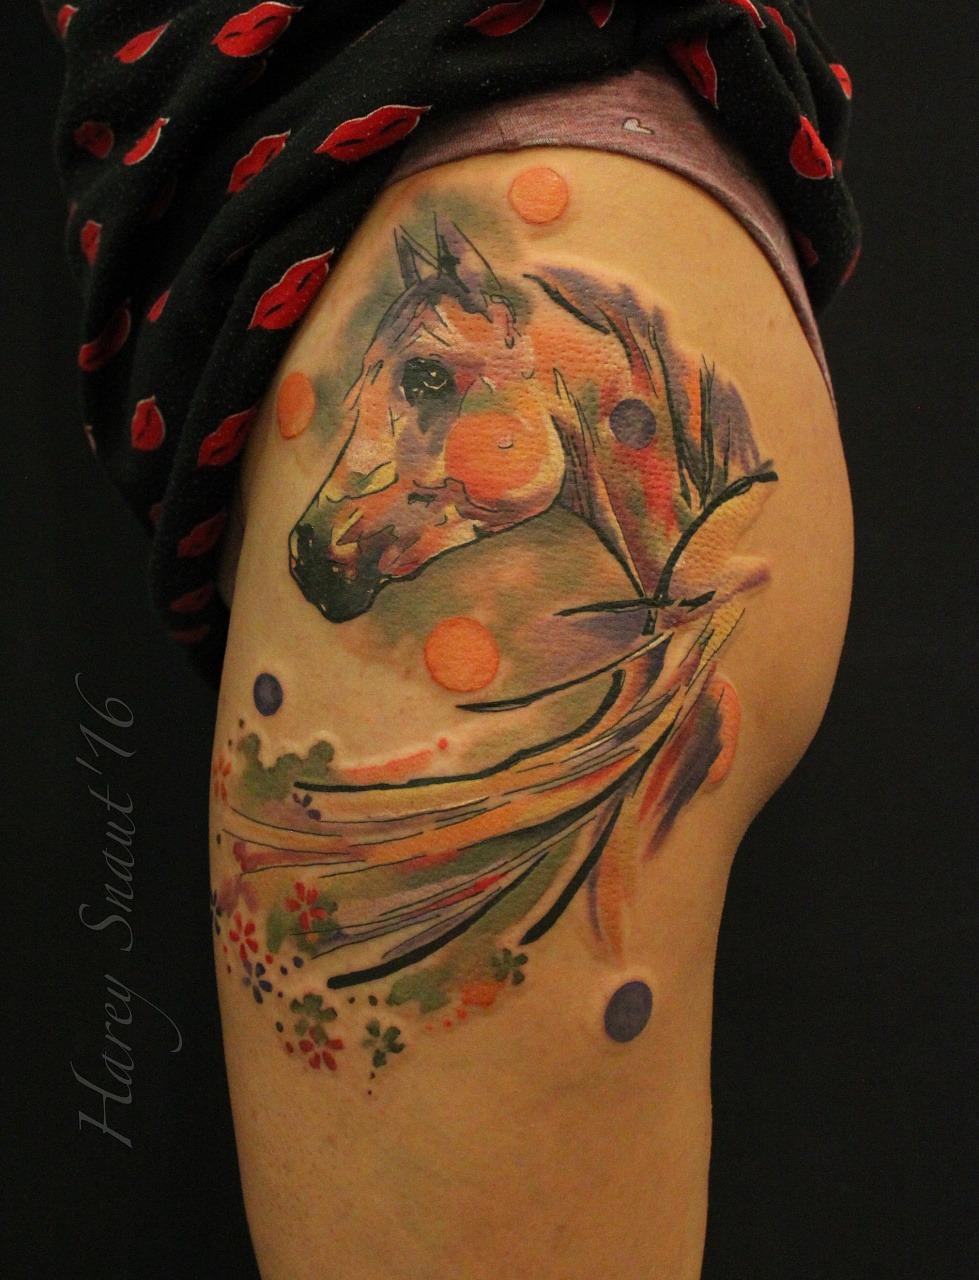 tatuirovk%C2%A6-_loshad_v_stile_akvarel_na_bedro_22667.jpg